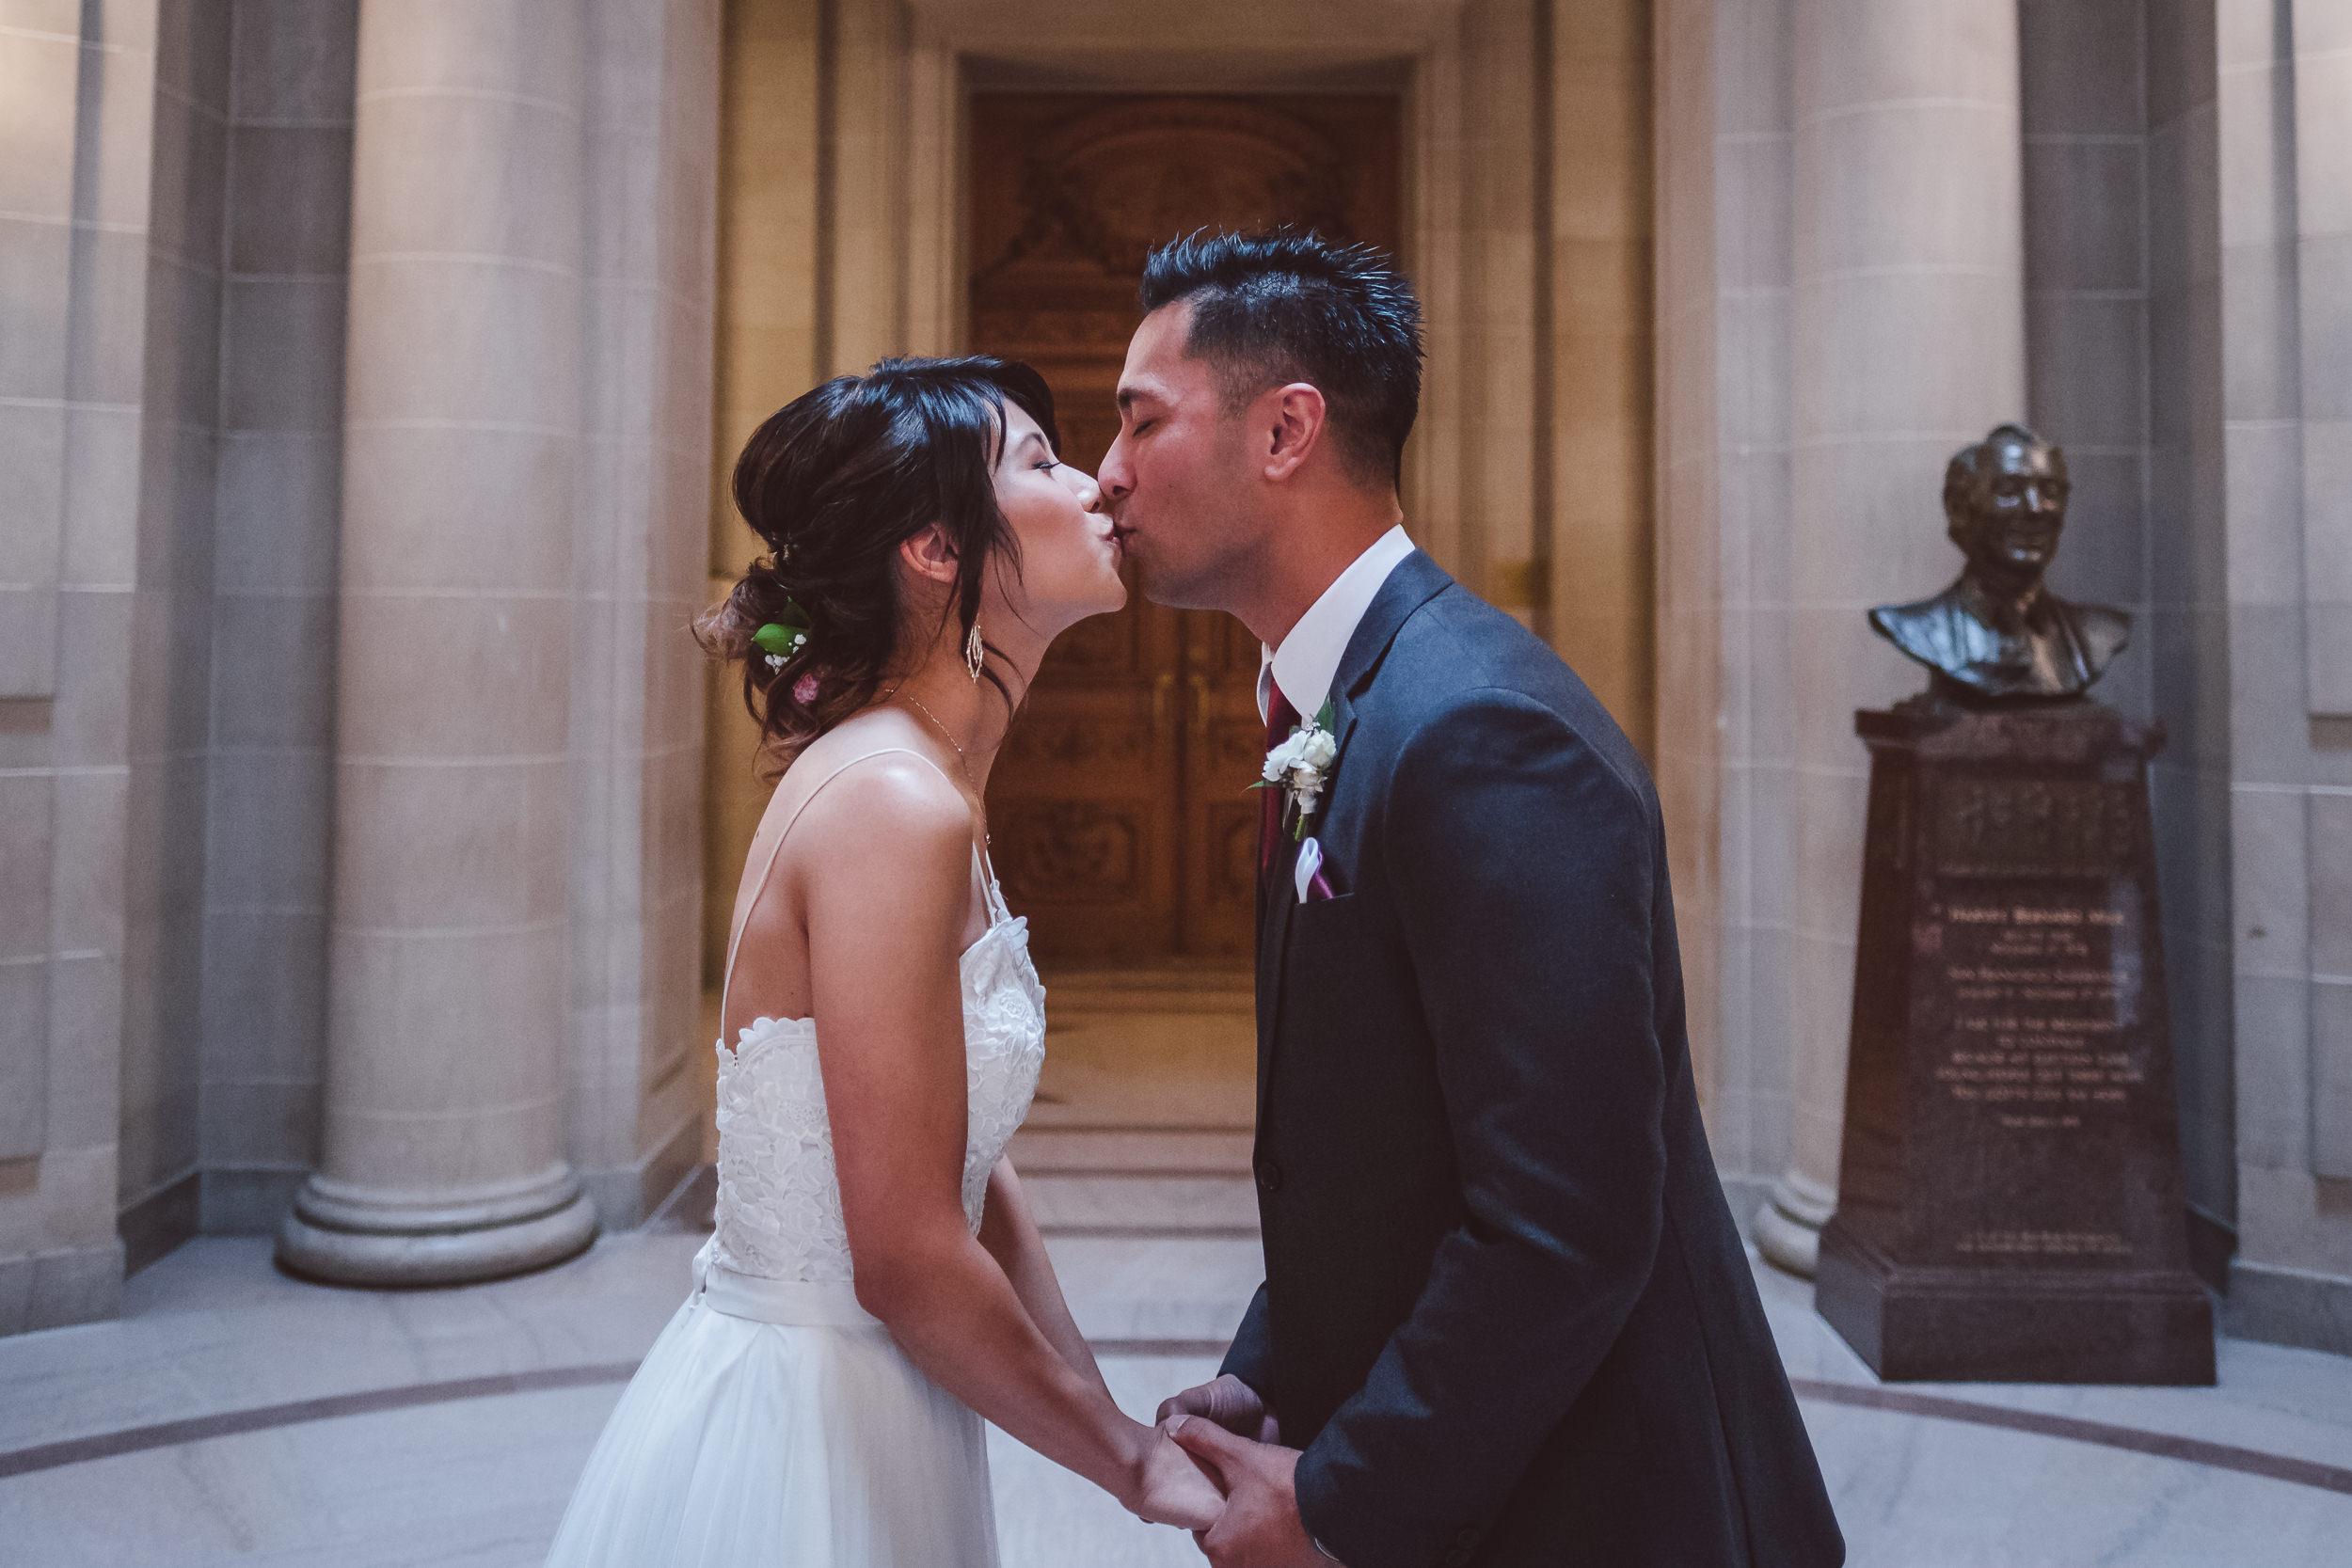 San-Francisco-City-Hall-Wedding-Photography-051.jpg